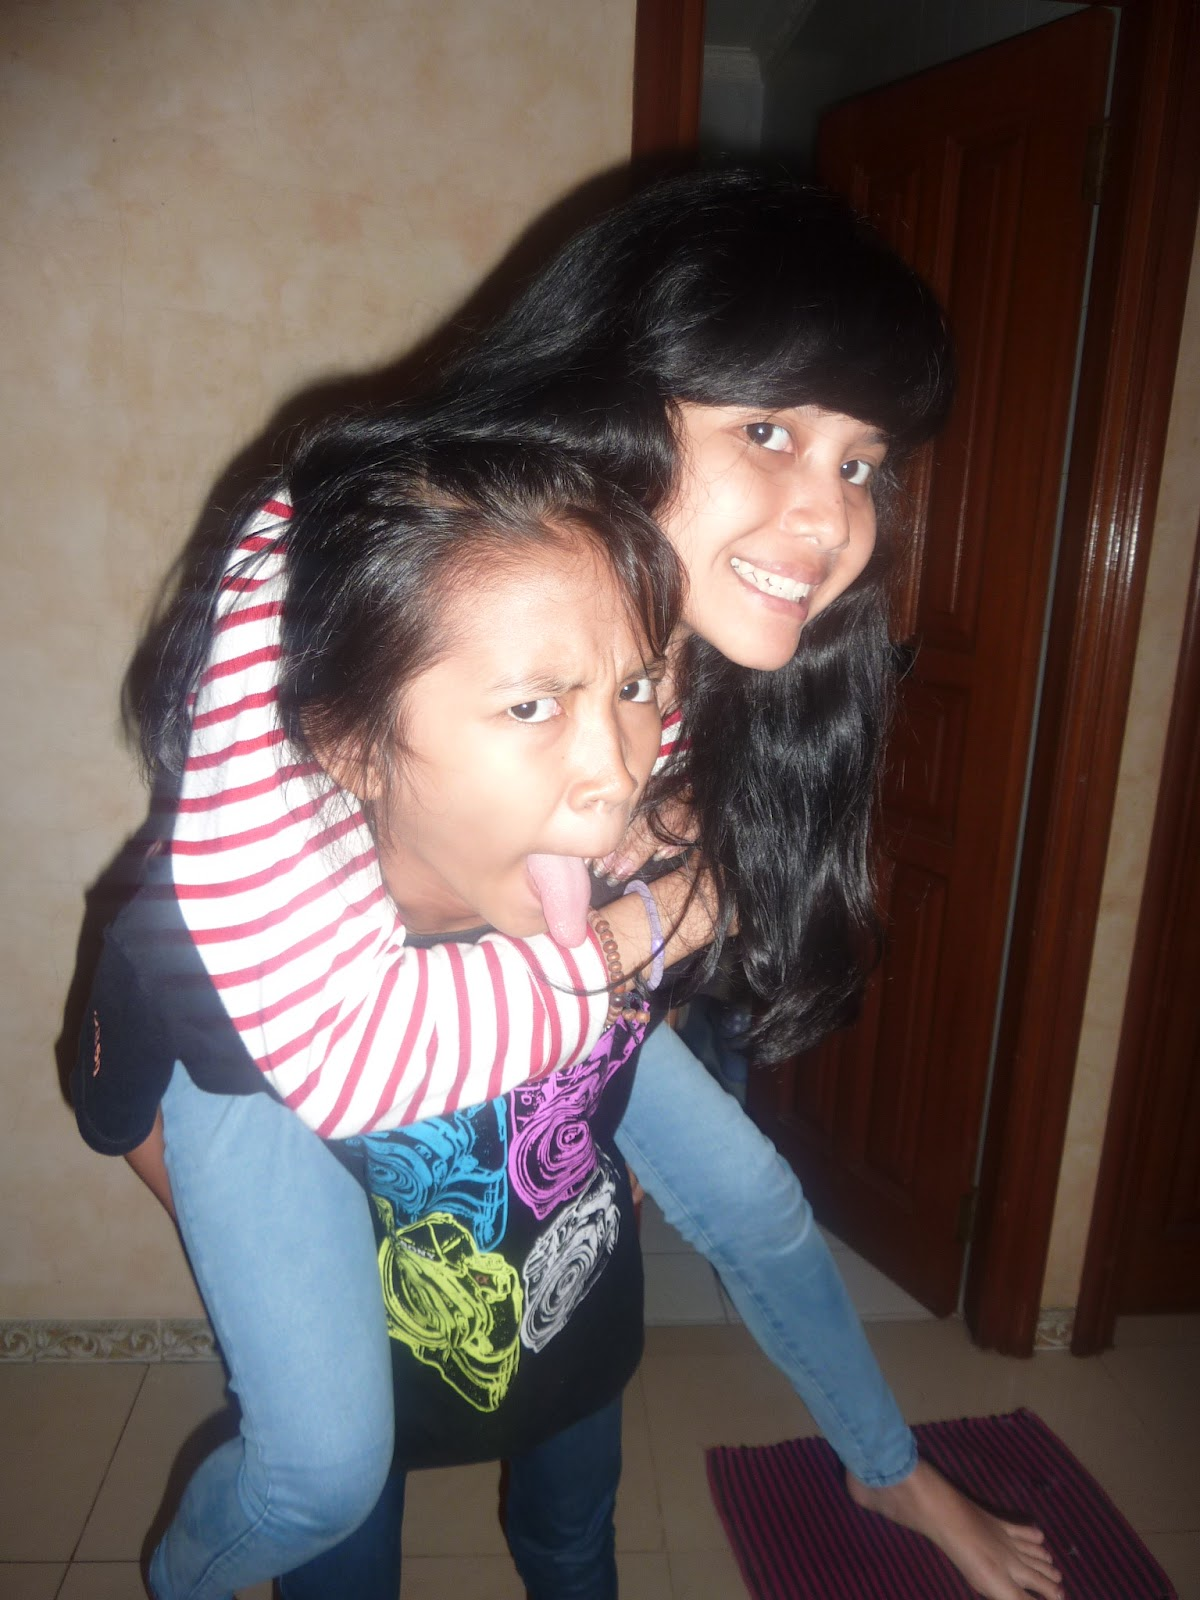 bokep anak kecil @@@ ... foto-foto kita waktu kita sedang mengadakan acara makrab kecil-kecilla({})  Miss that moment;;)